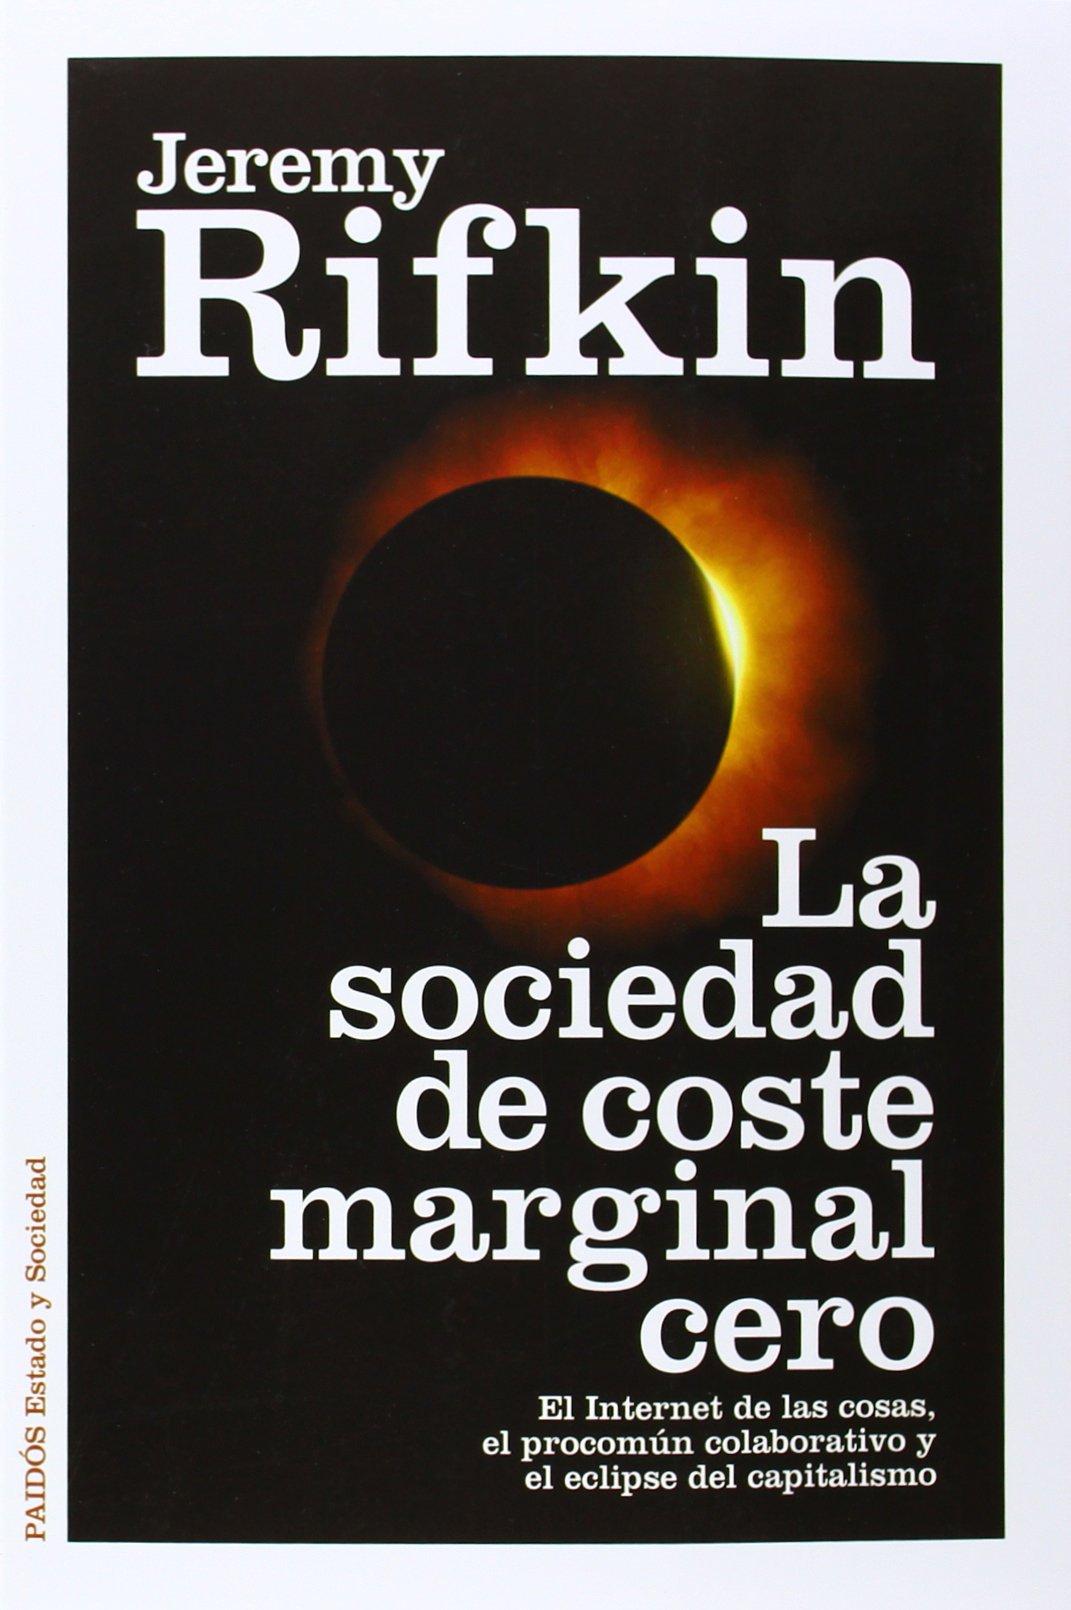 libro-jeremy-rifkin